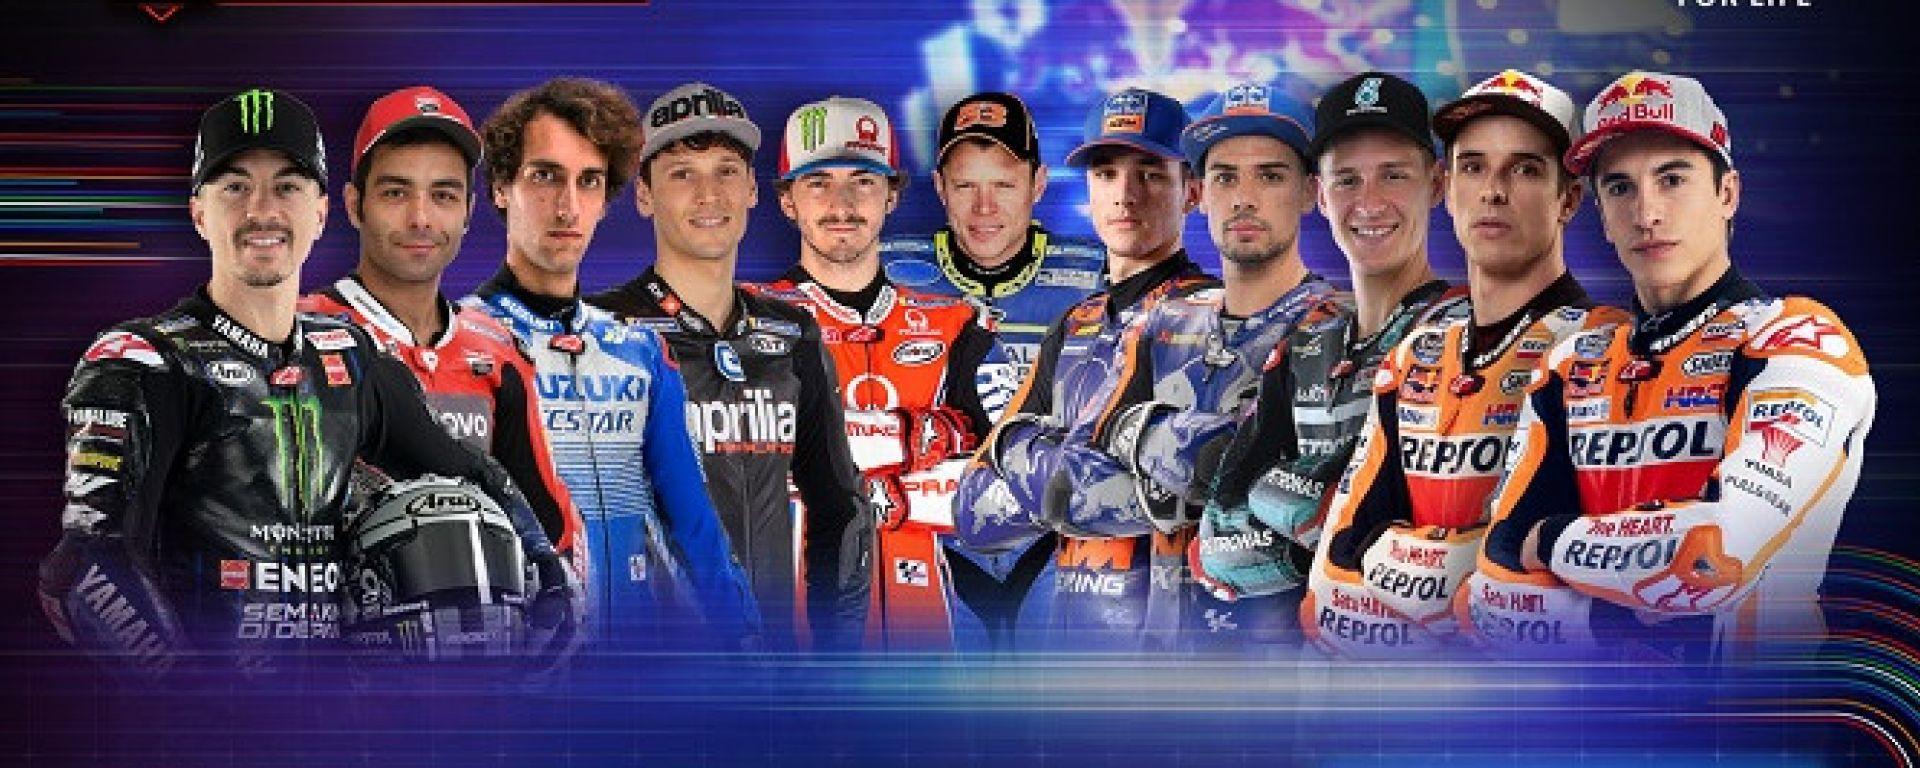 #VirtualSpanishGP eSports Virtual Grand Prix Spain MotoGP